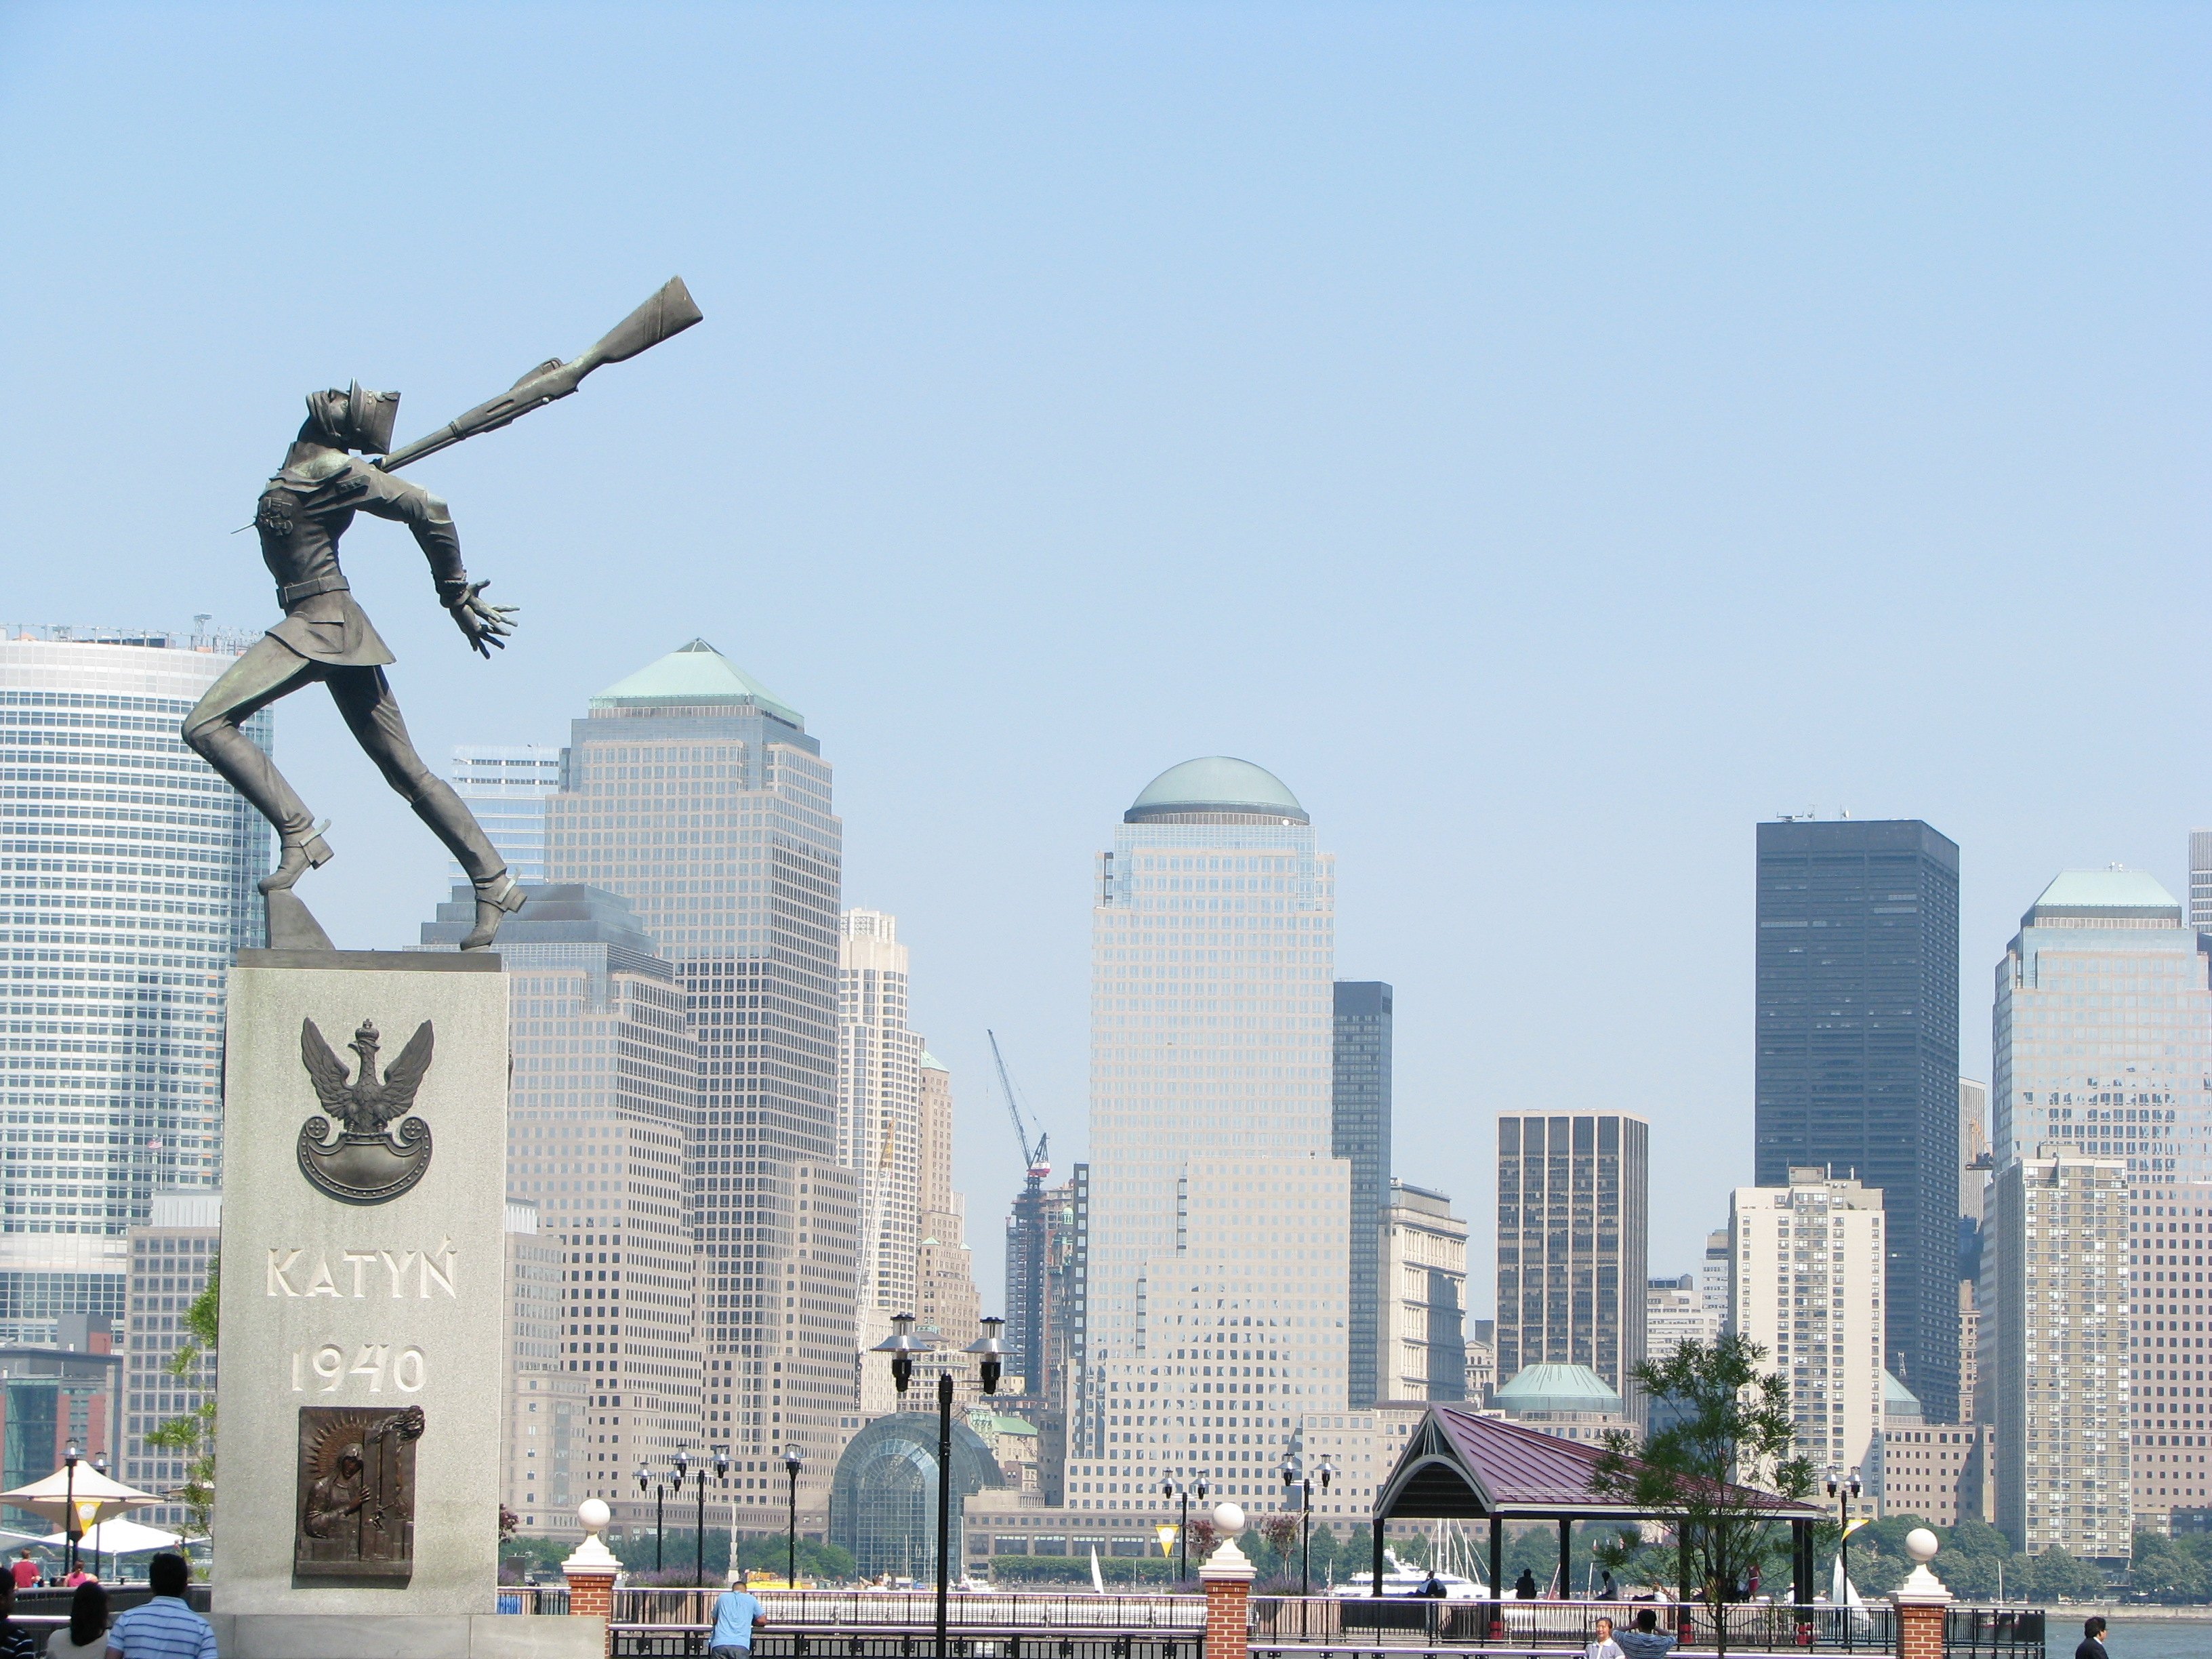 Downtown Manhattan from Jersey City